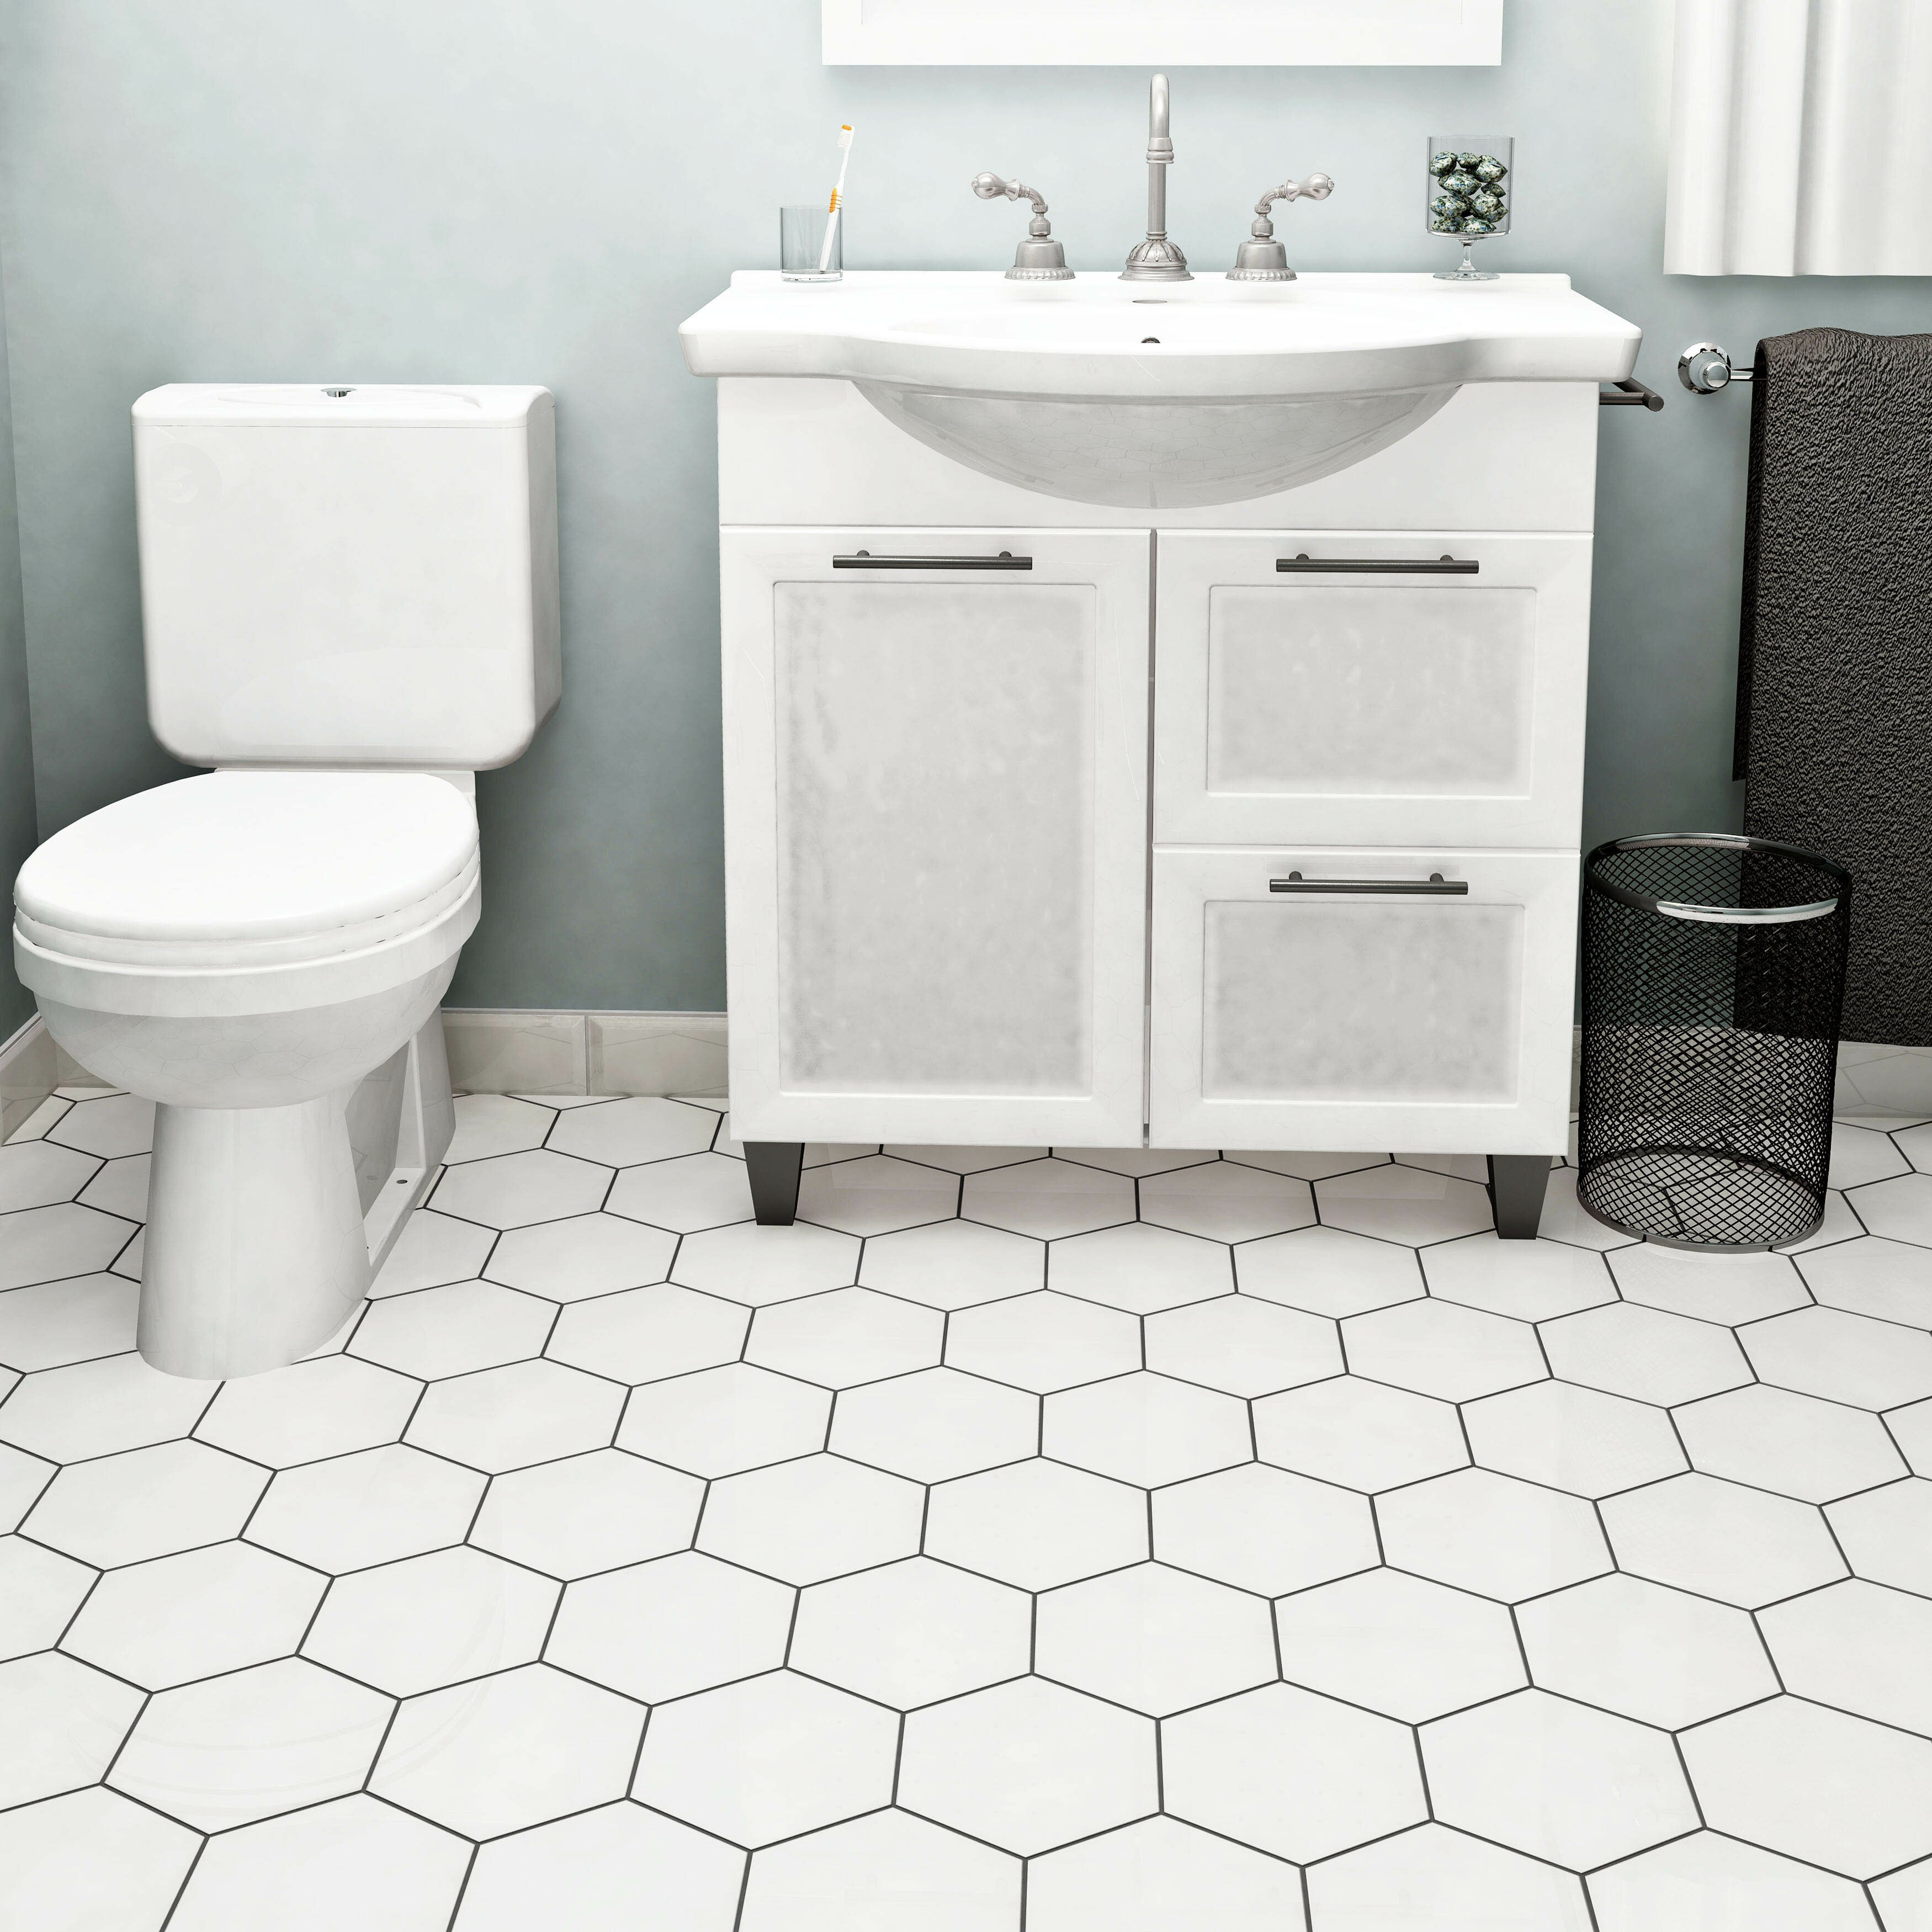 Elitetile hexitile 7 x 8 porcelain mosaic tile in glossy for Bathroom designs 8x7